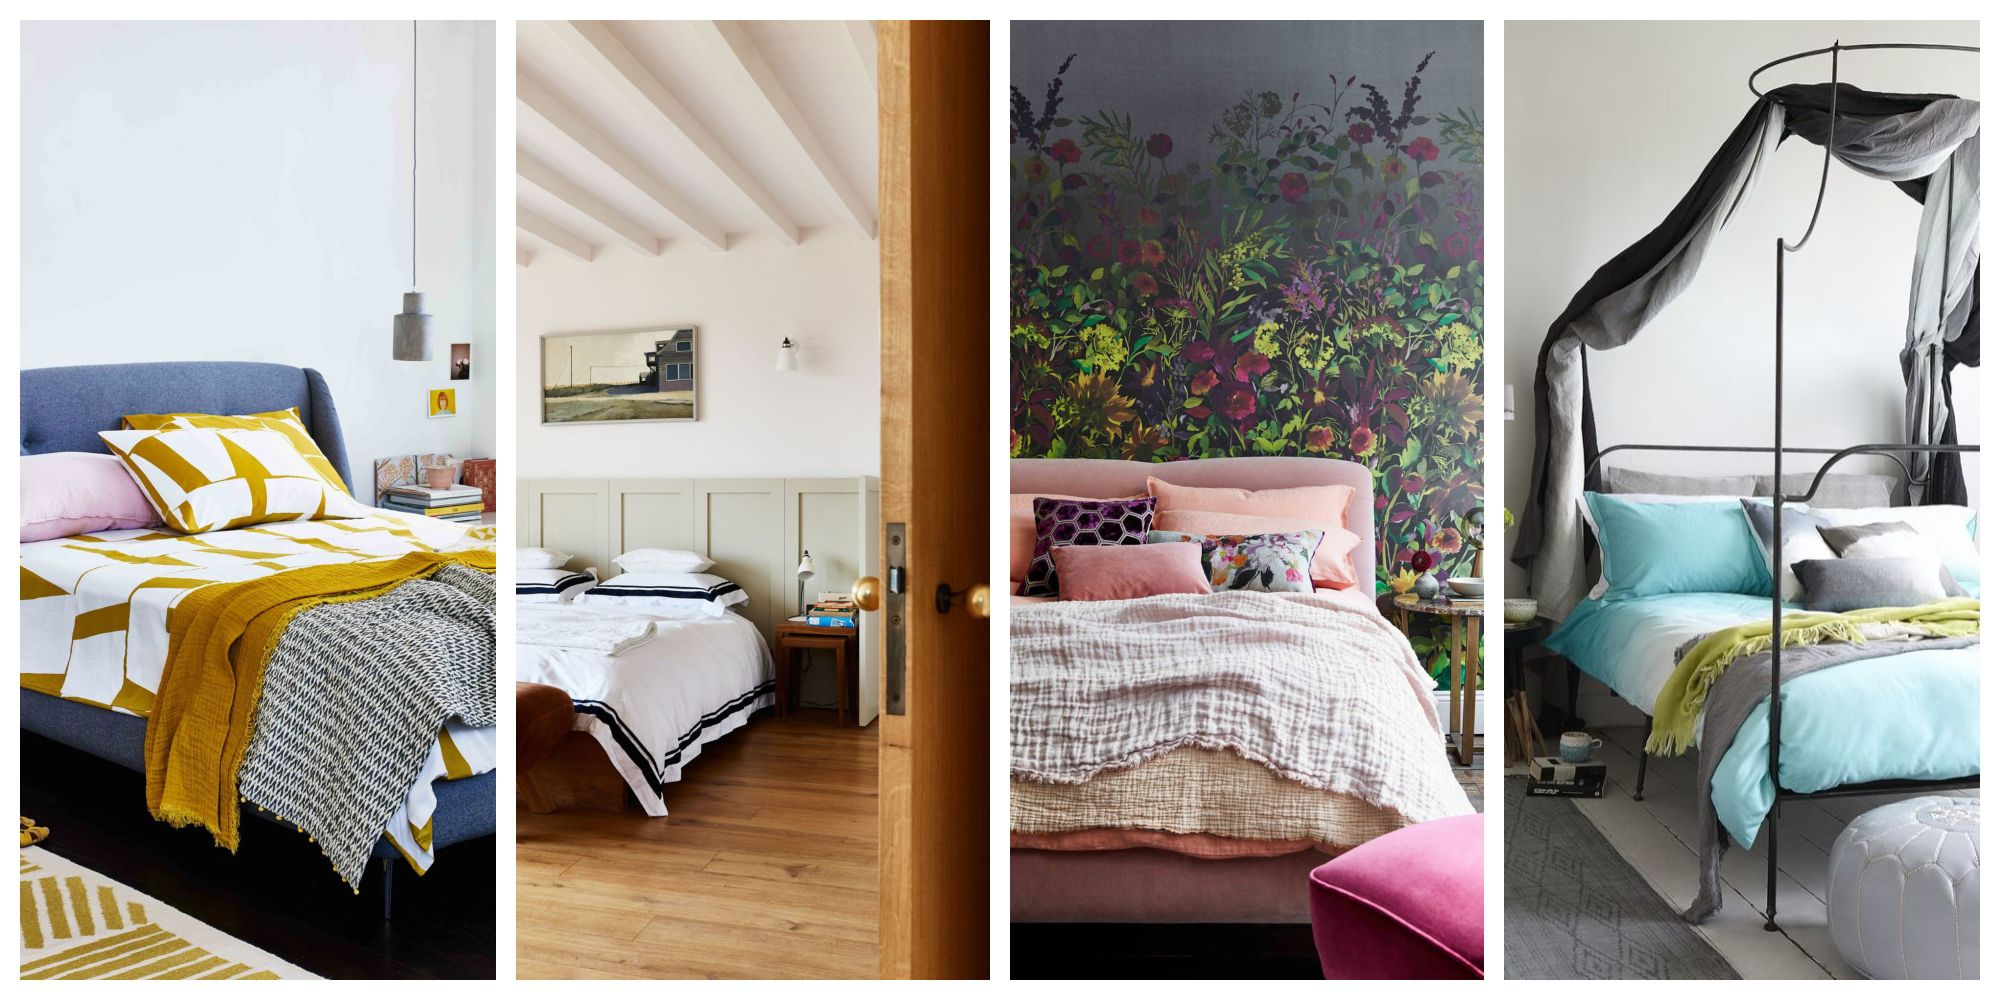 40 Beautiful Bedroom Decorating Ideas - Modern Bedroom Ideas